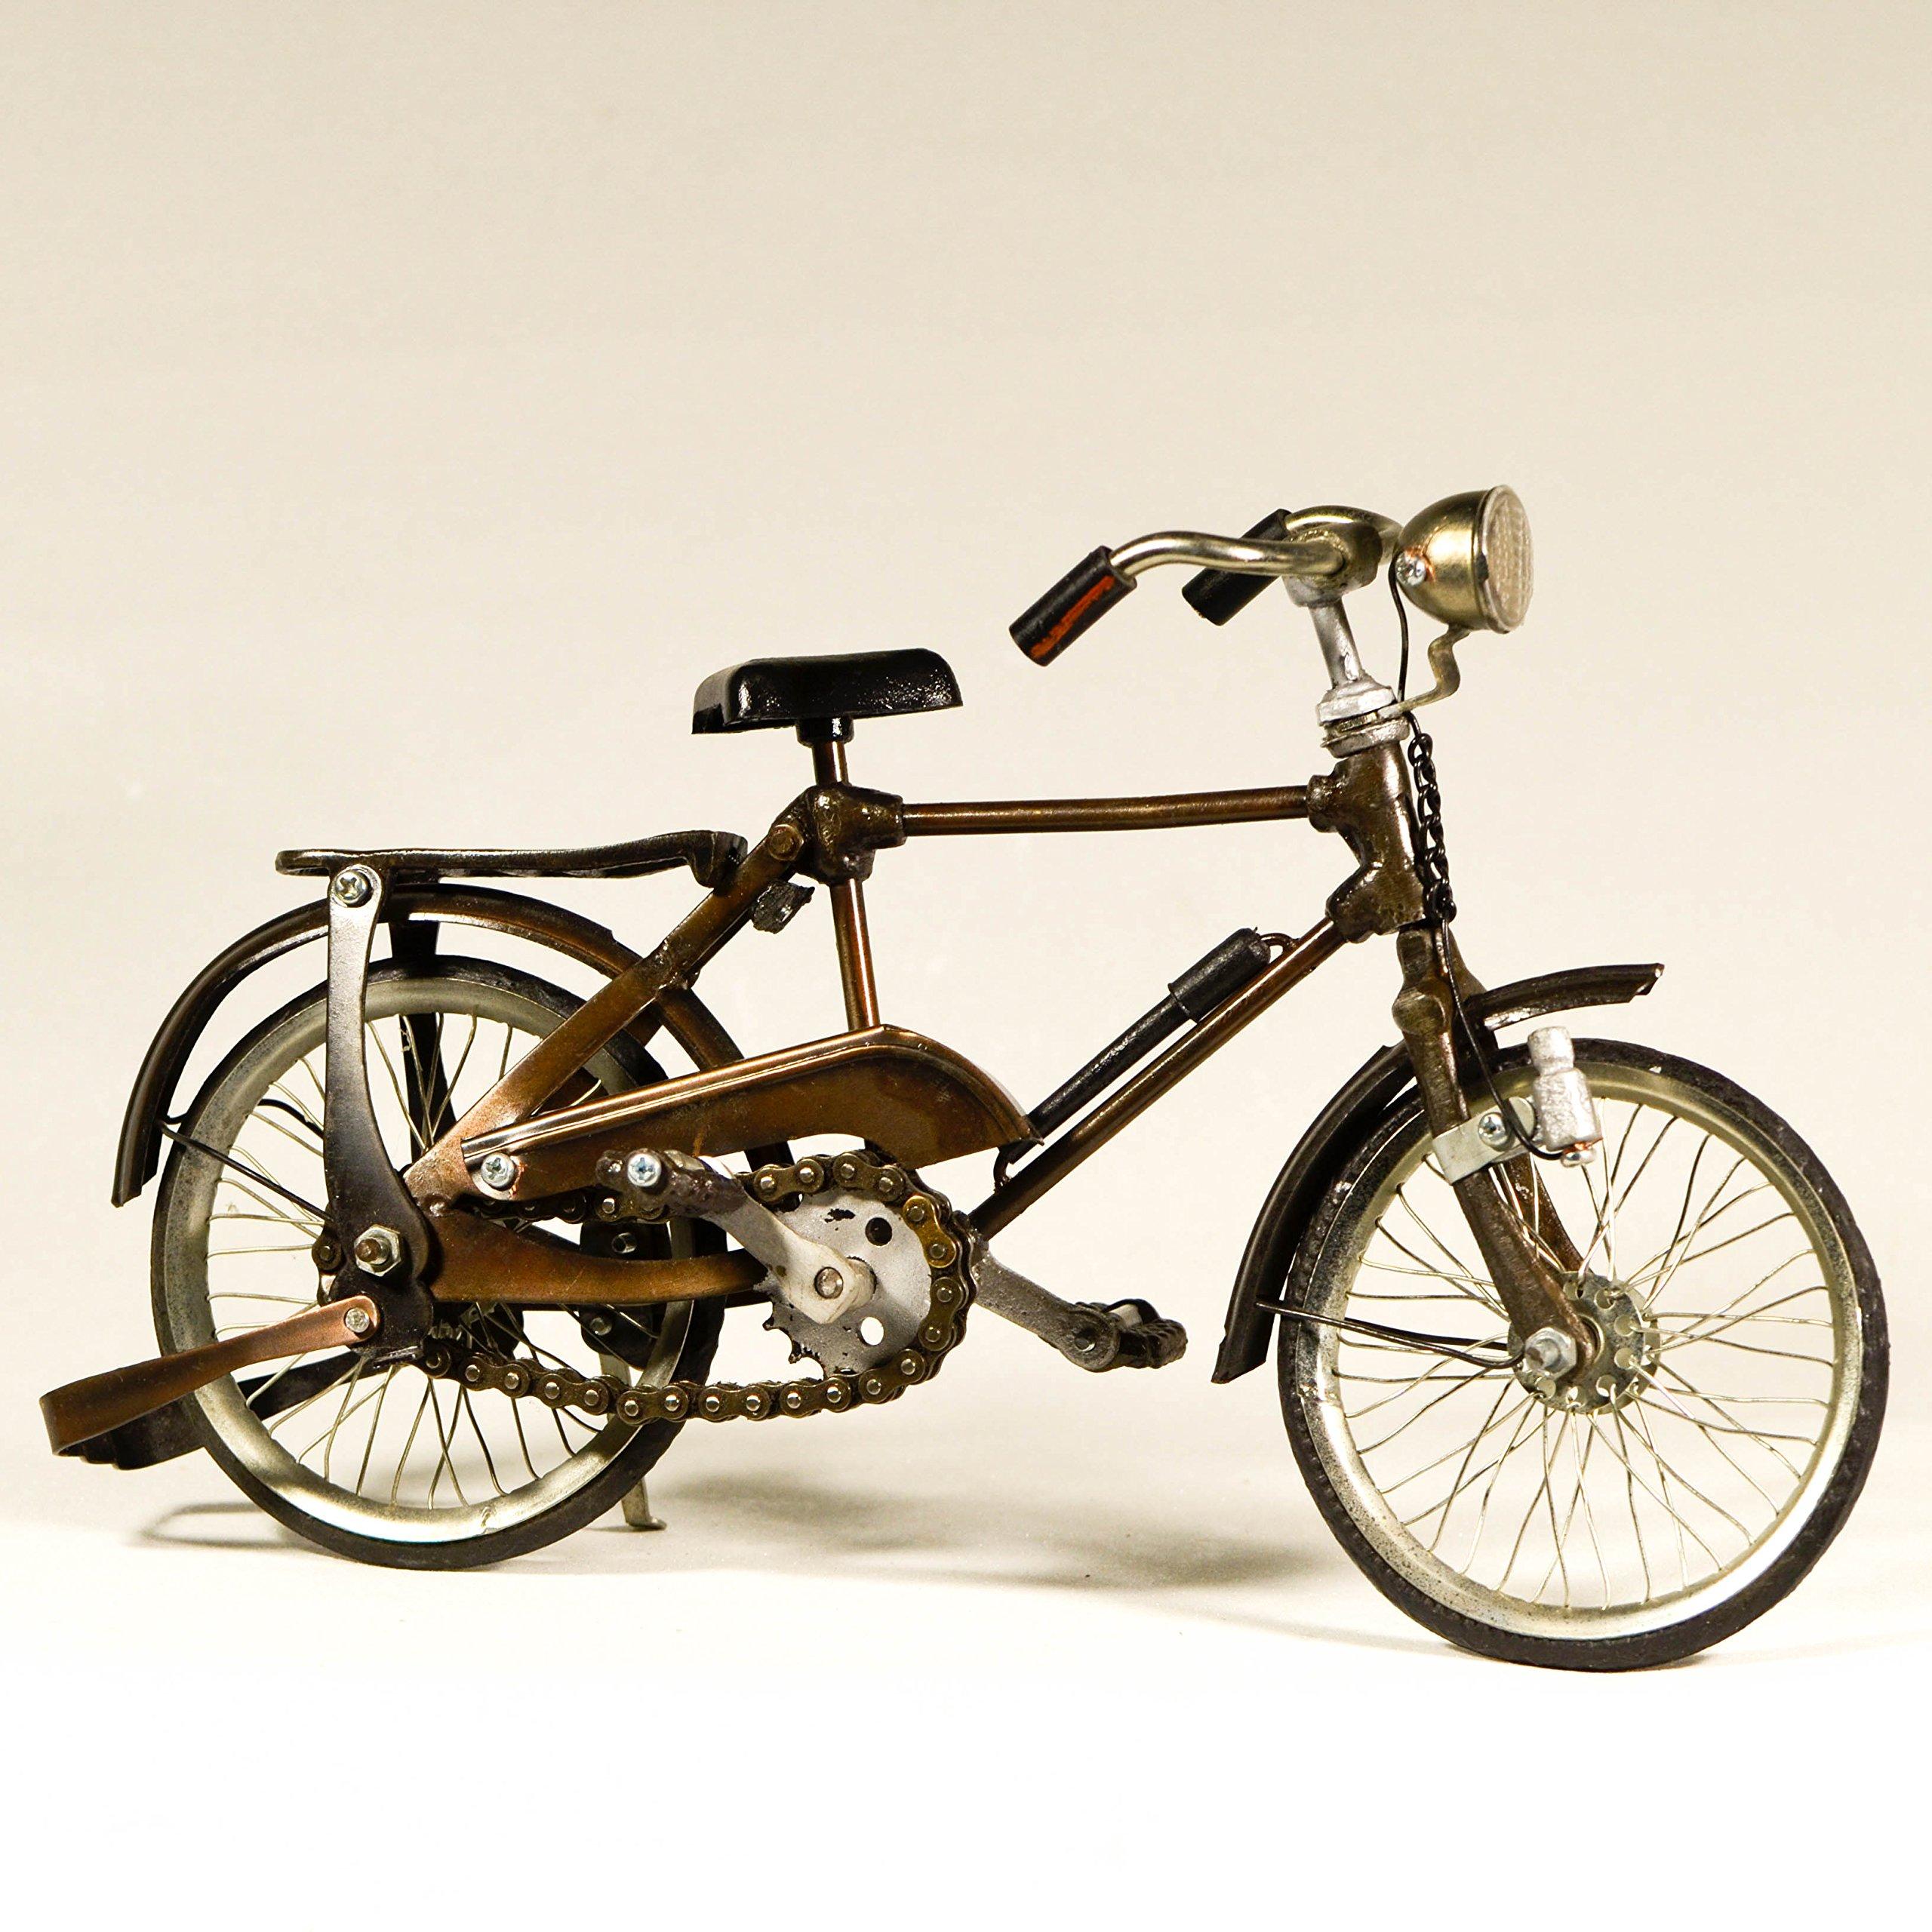 Modelos de bicicleta clásicos de metal – único troquelado ...